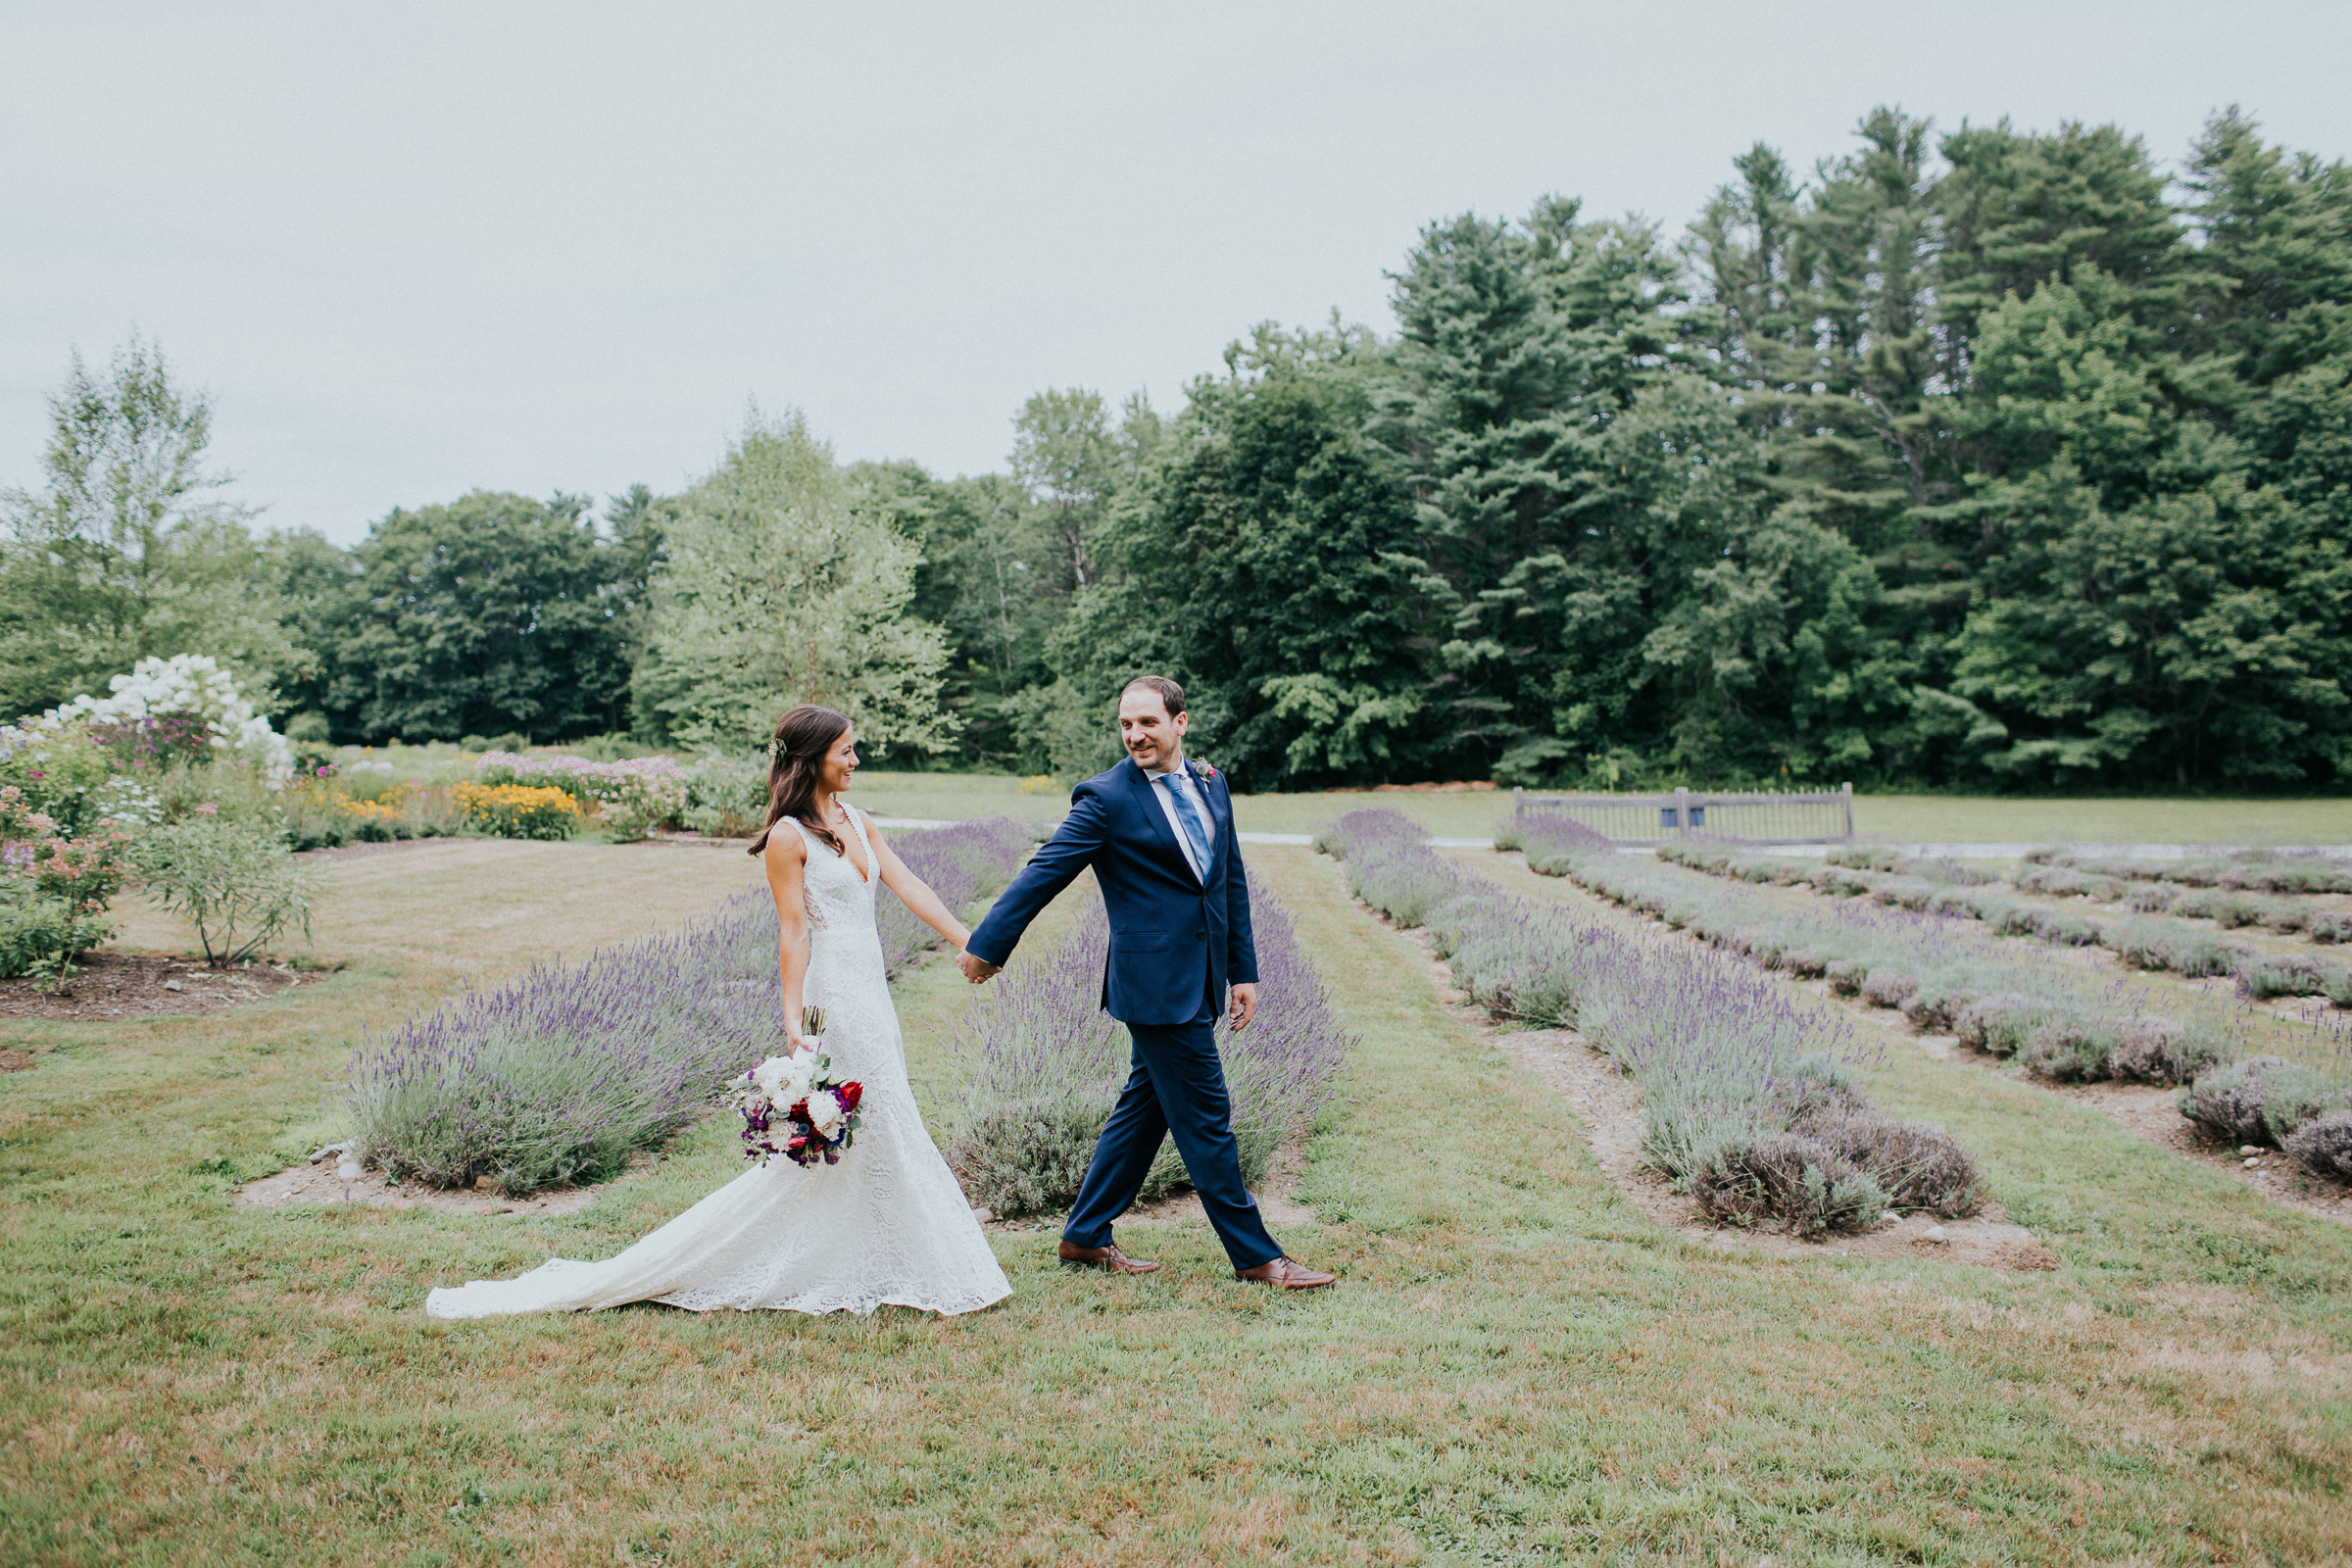 Marianmade-Farm-Wiscasset-Maine-Fine-Art-Documentary-Wedding-Photographer-Elvira-Kalviste-Photography-43.jpg